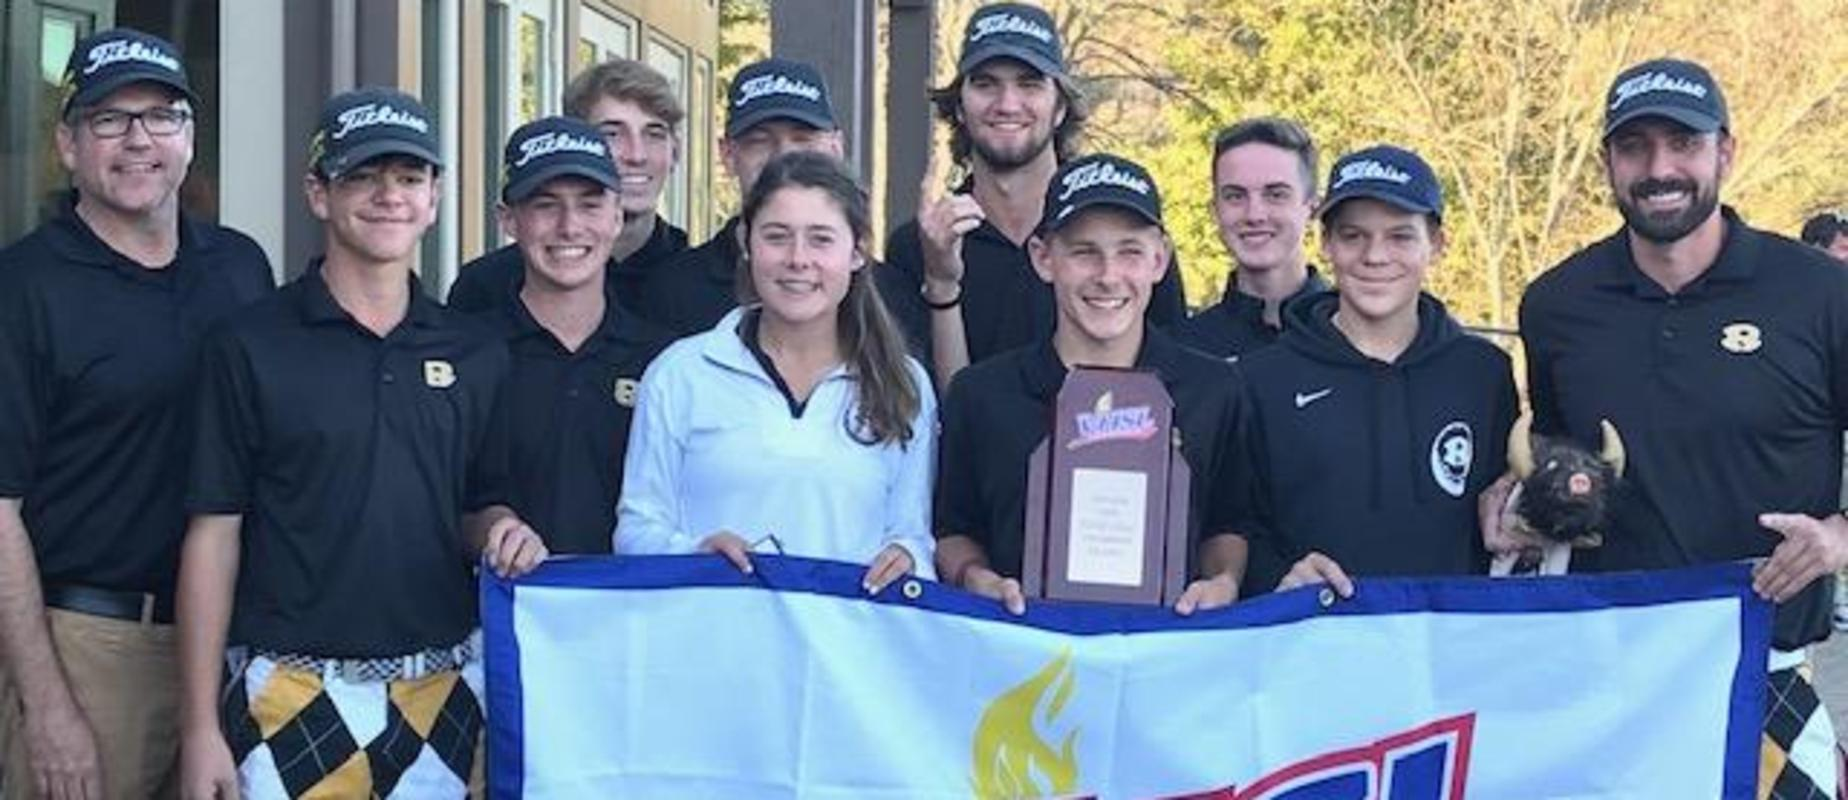 Golf team state champions